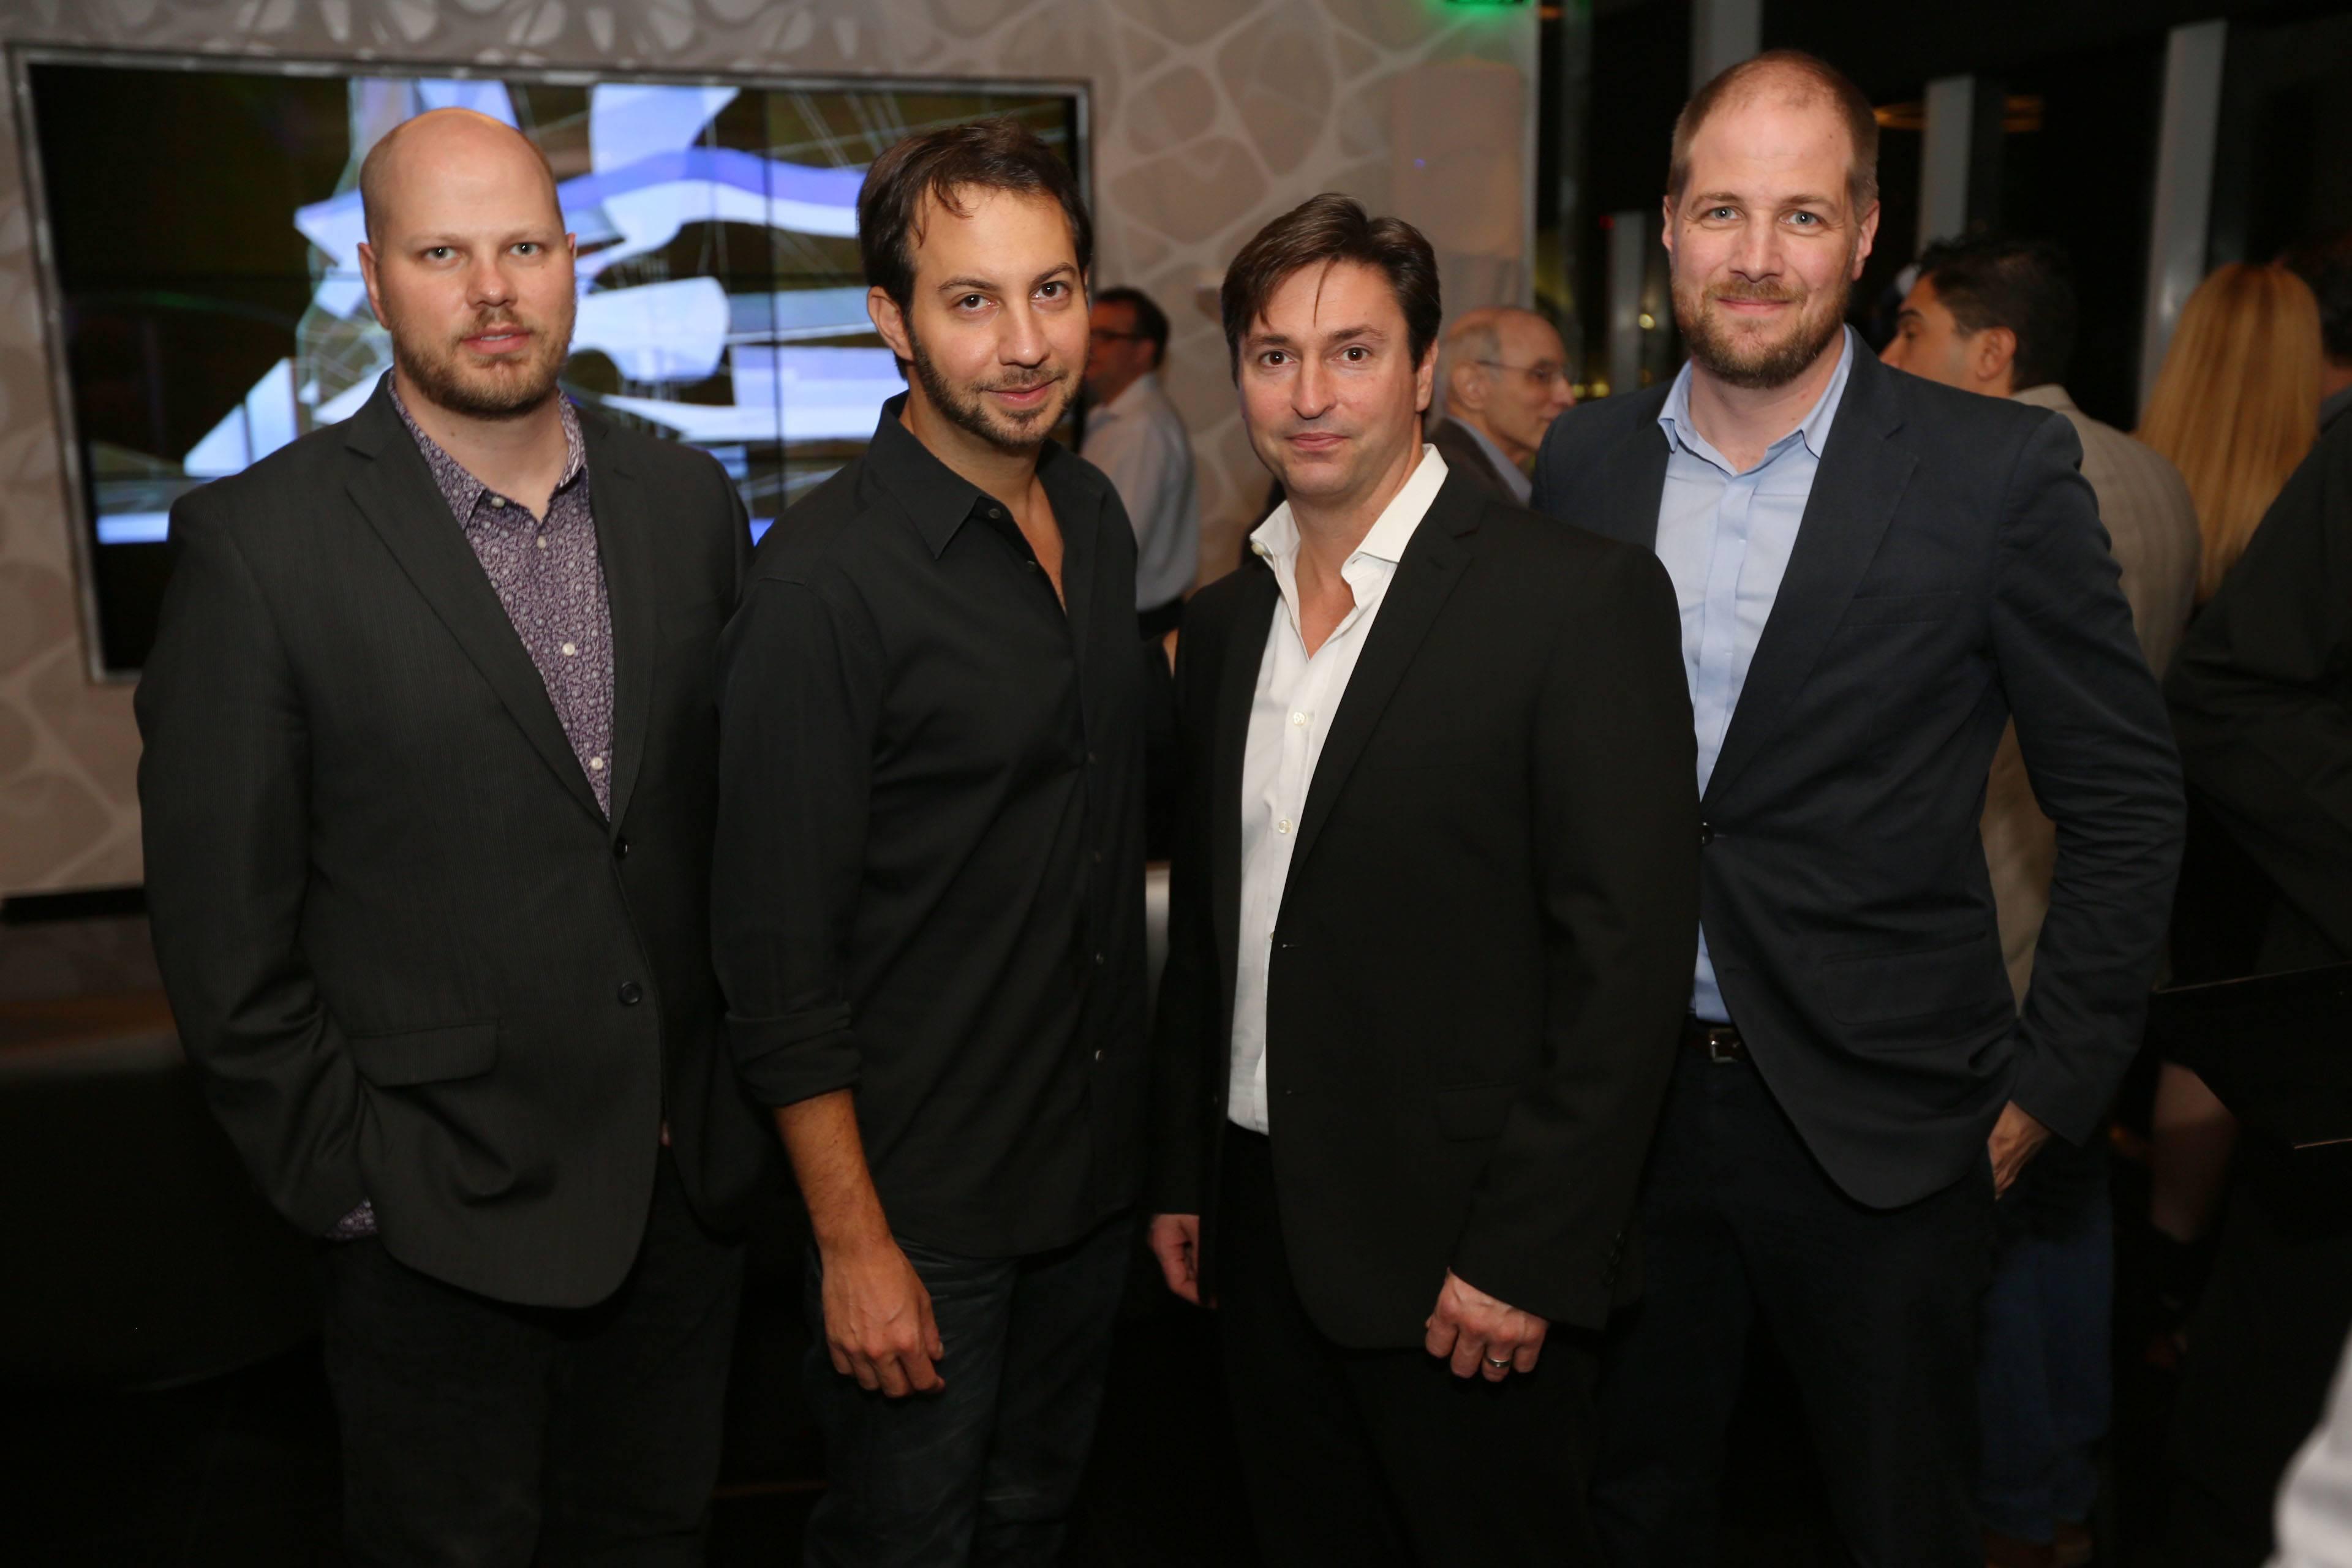 Michael Powers, Jared Shapiro, Chris Levine, & Stephan Wurster